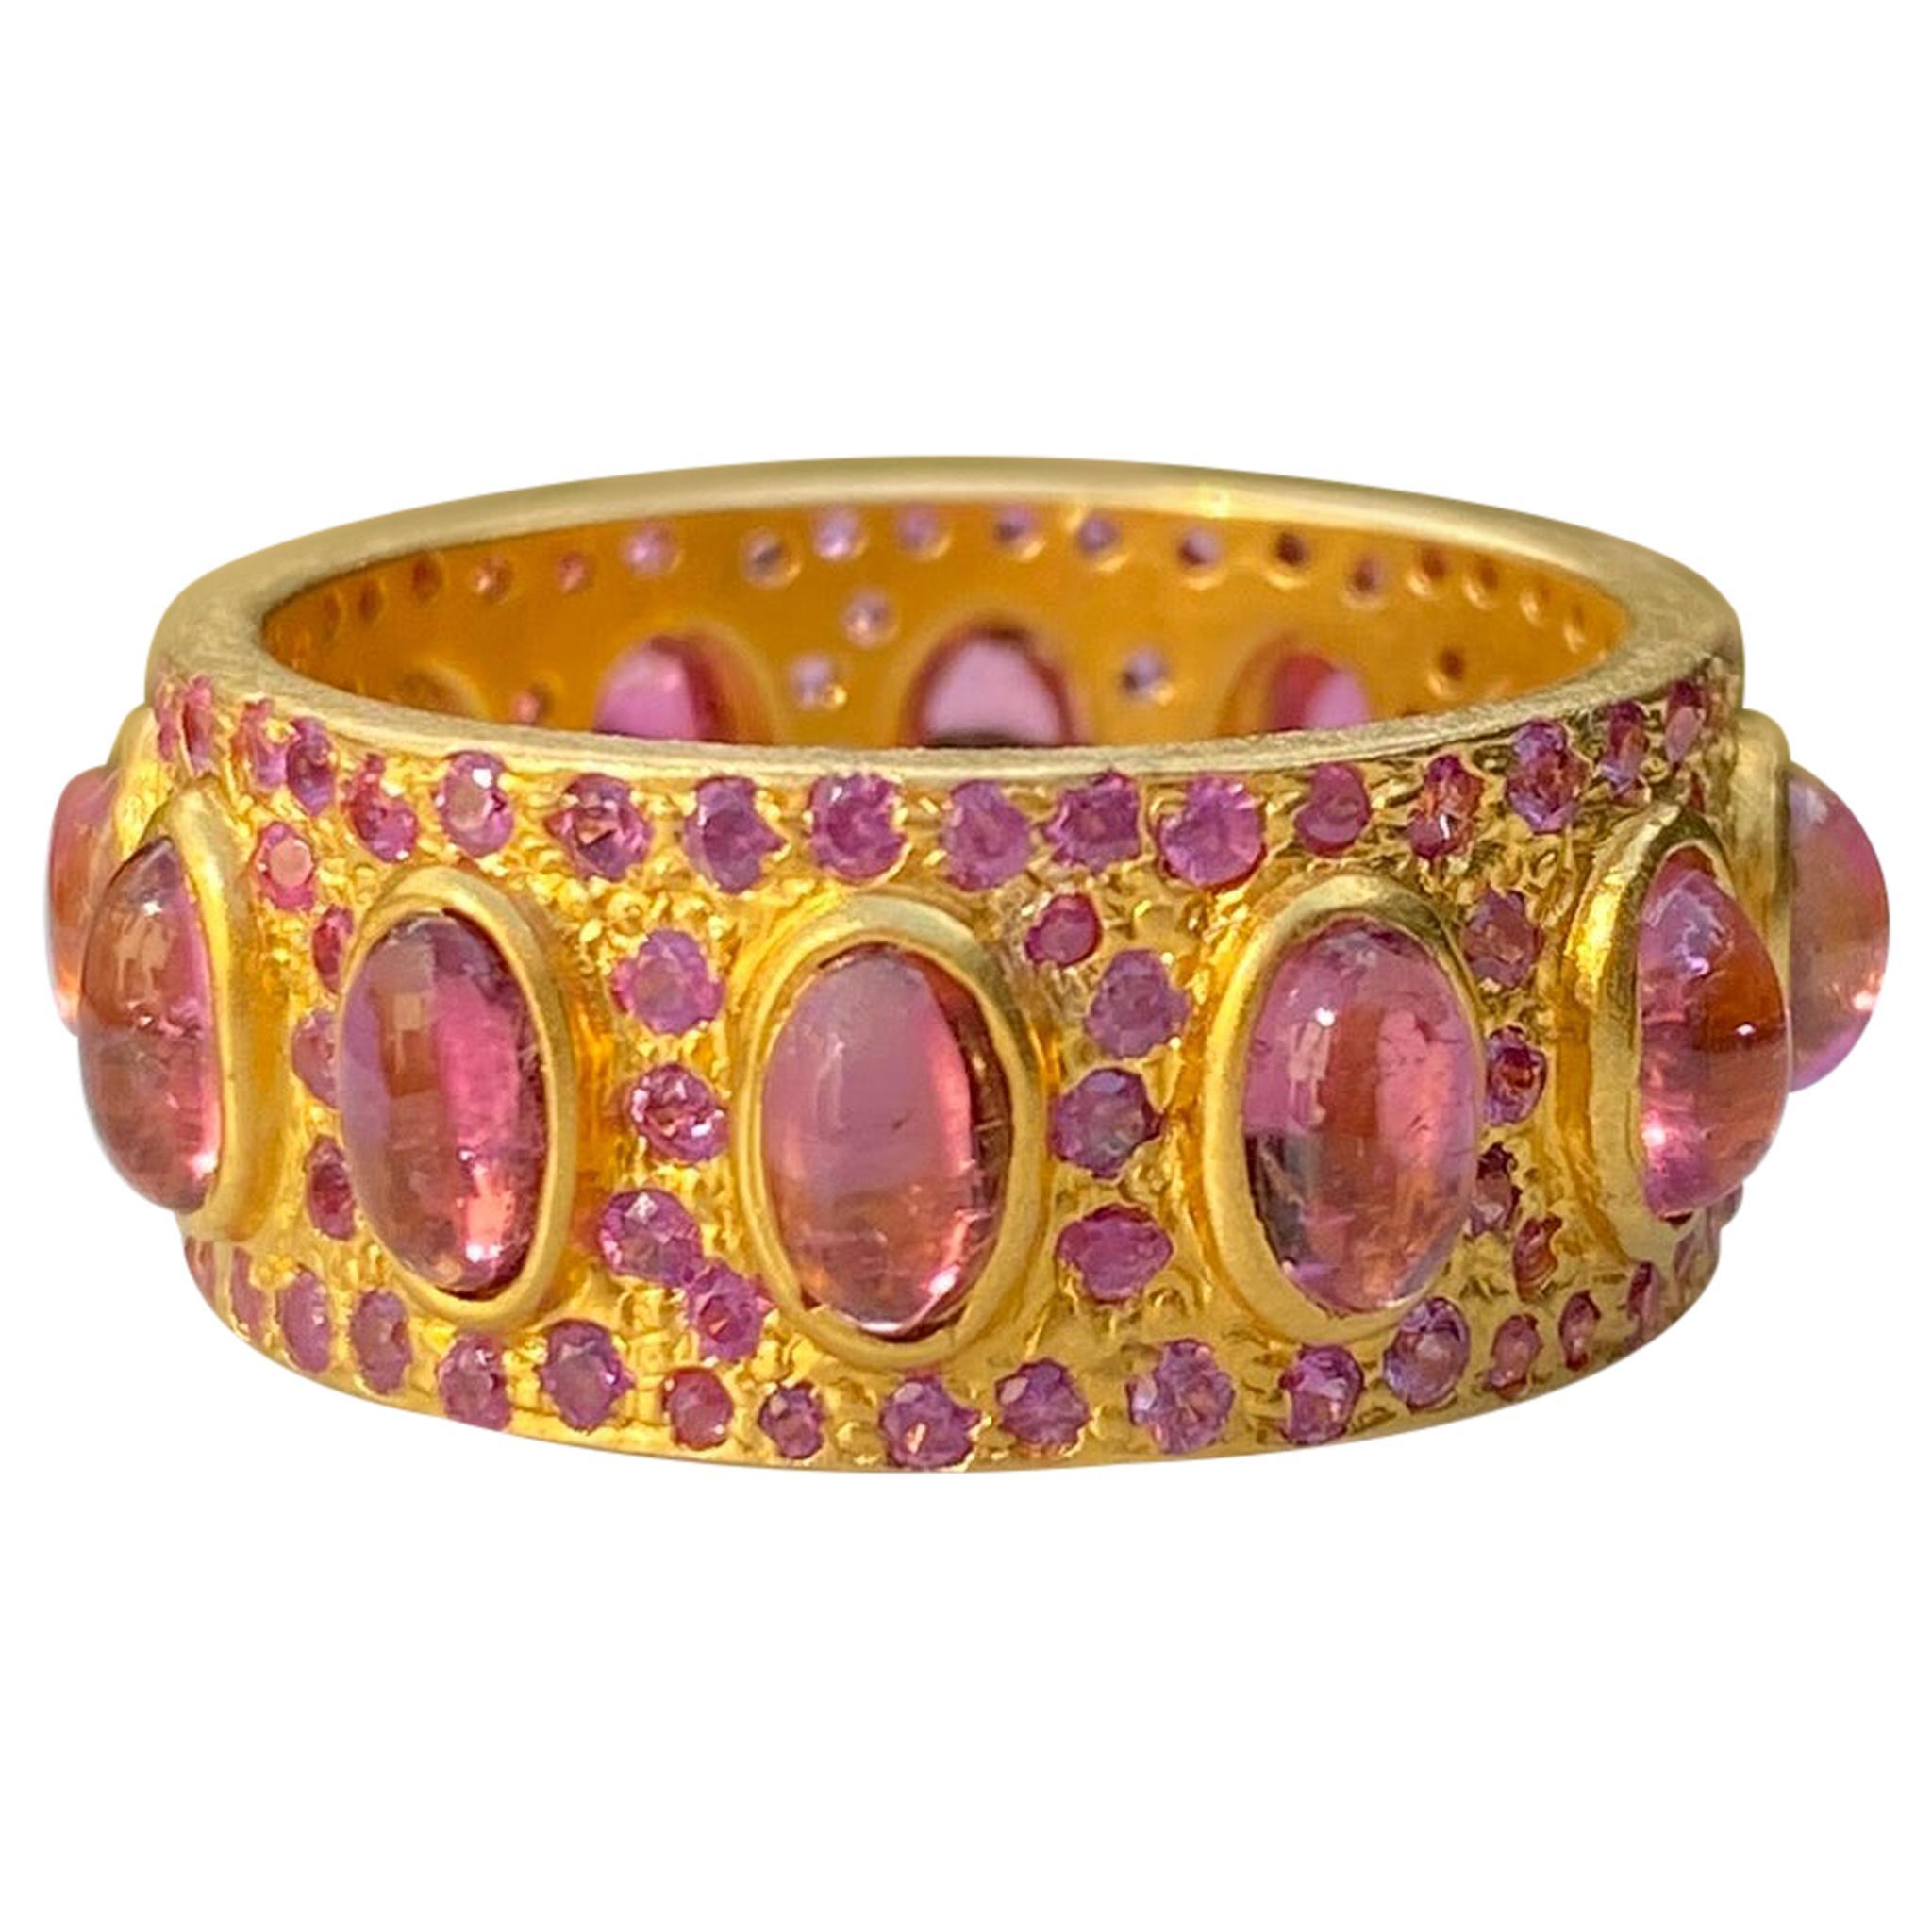 4.68 Carat Pink Tourmaline Gold Eternity Ring by Lauren Harper